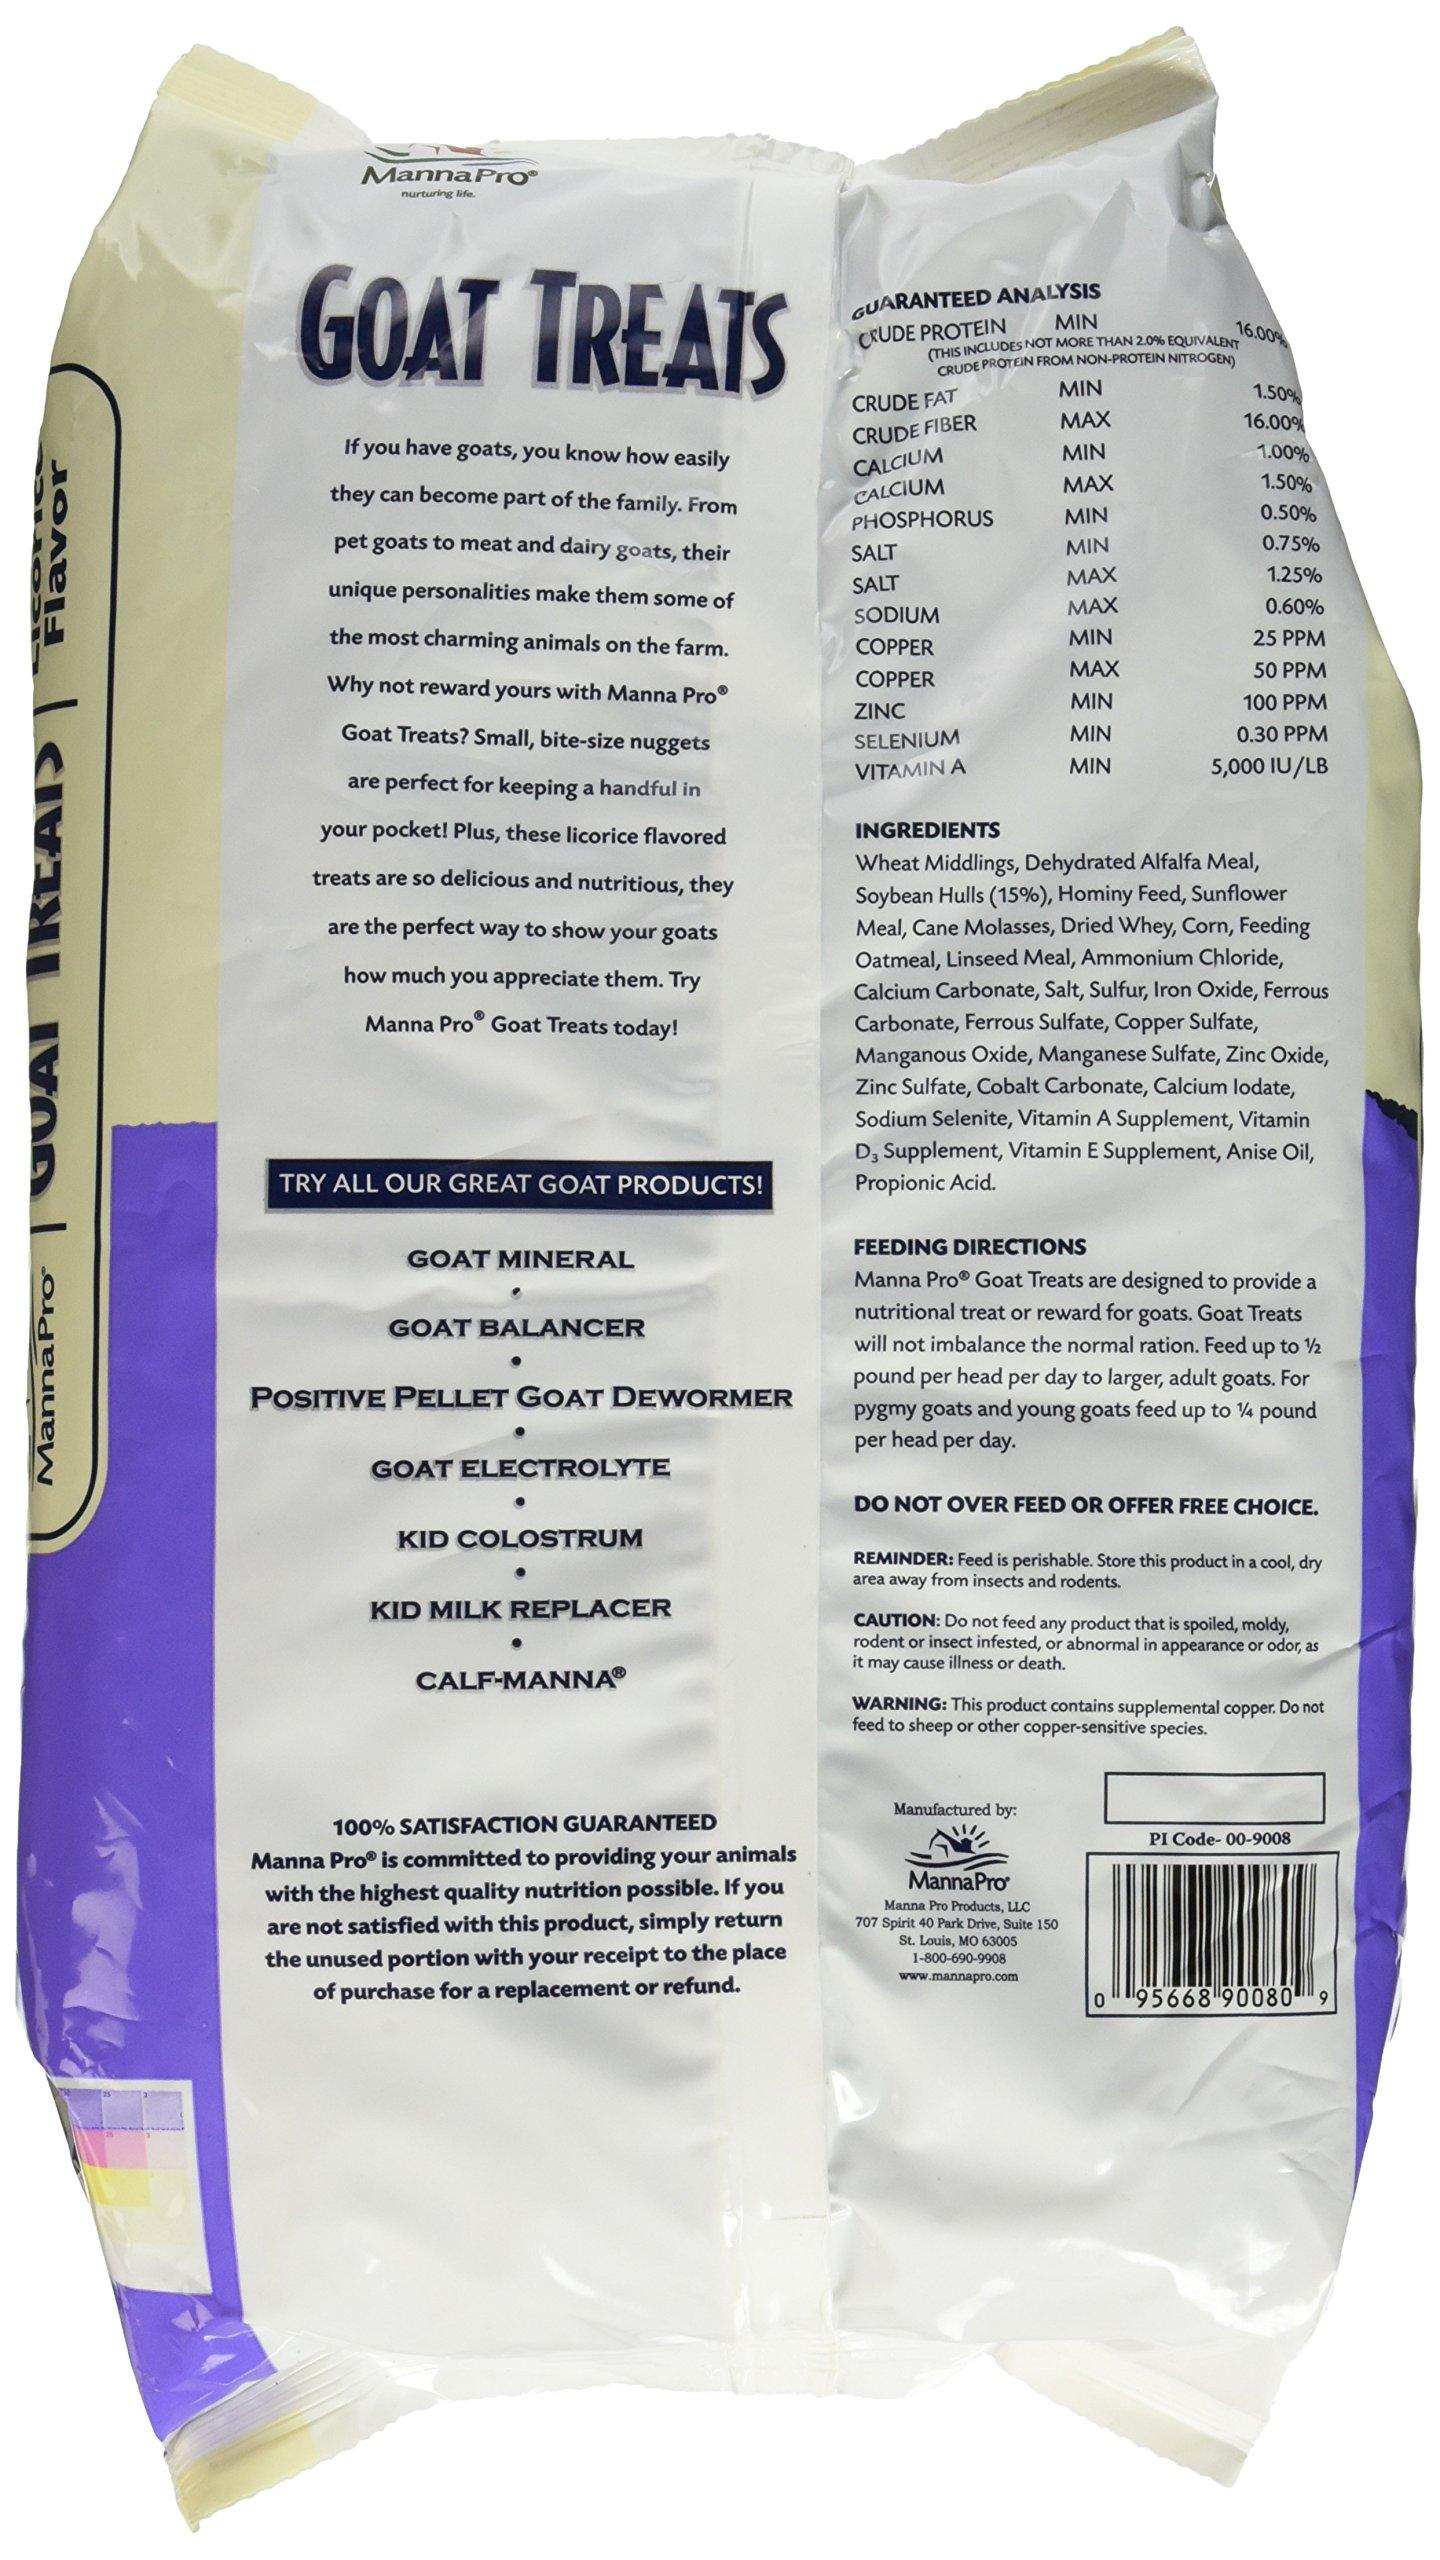 Manna Pro Licorice Goat Treats, 6 lb by Manna Pro (Image #3)